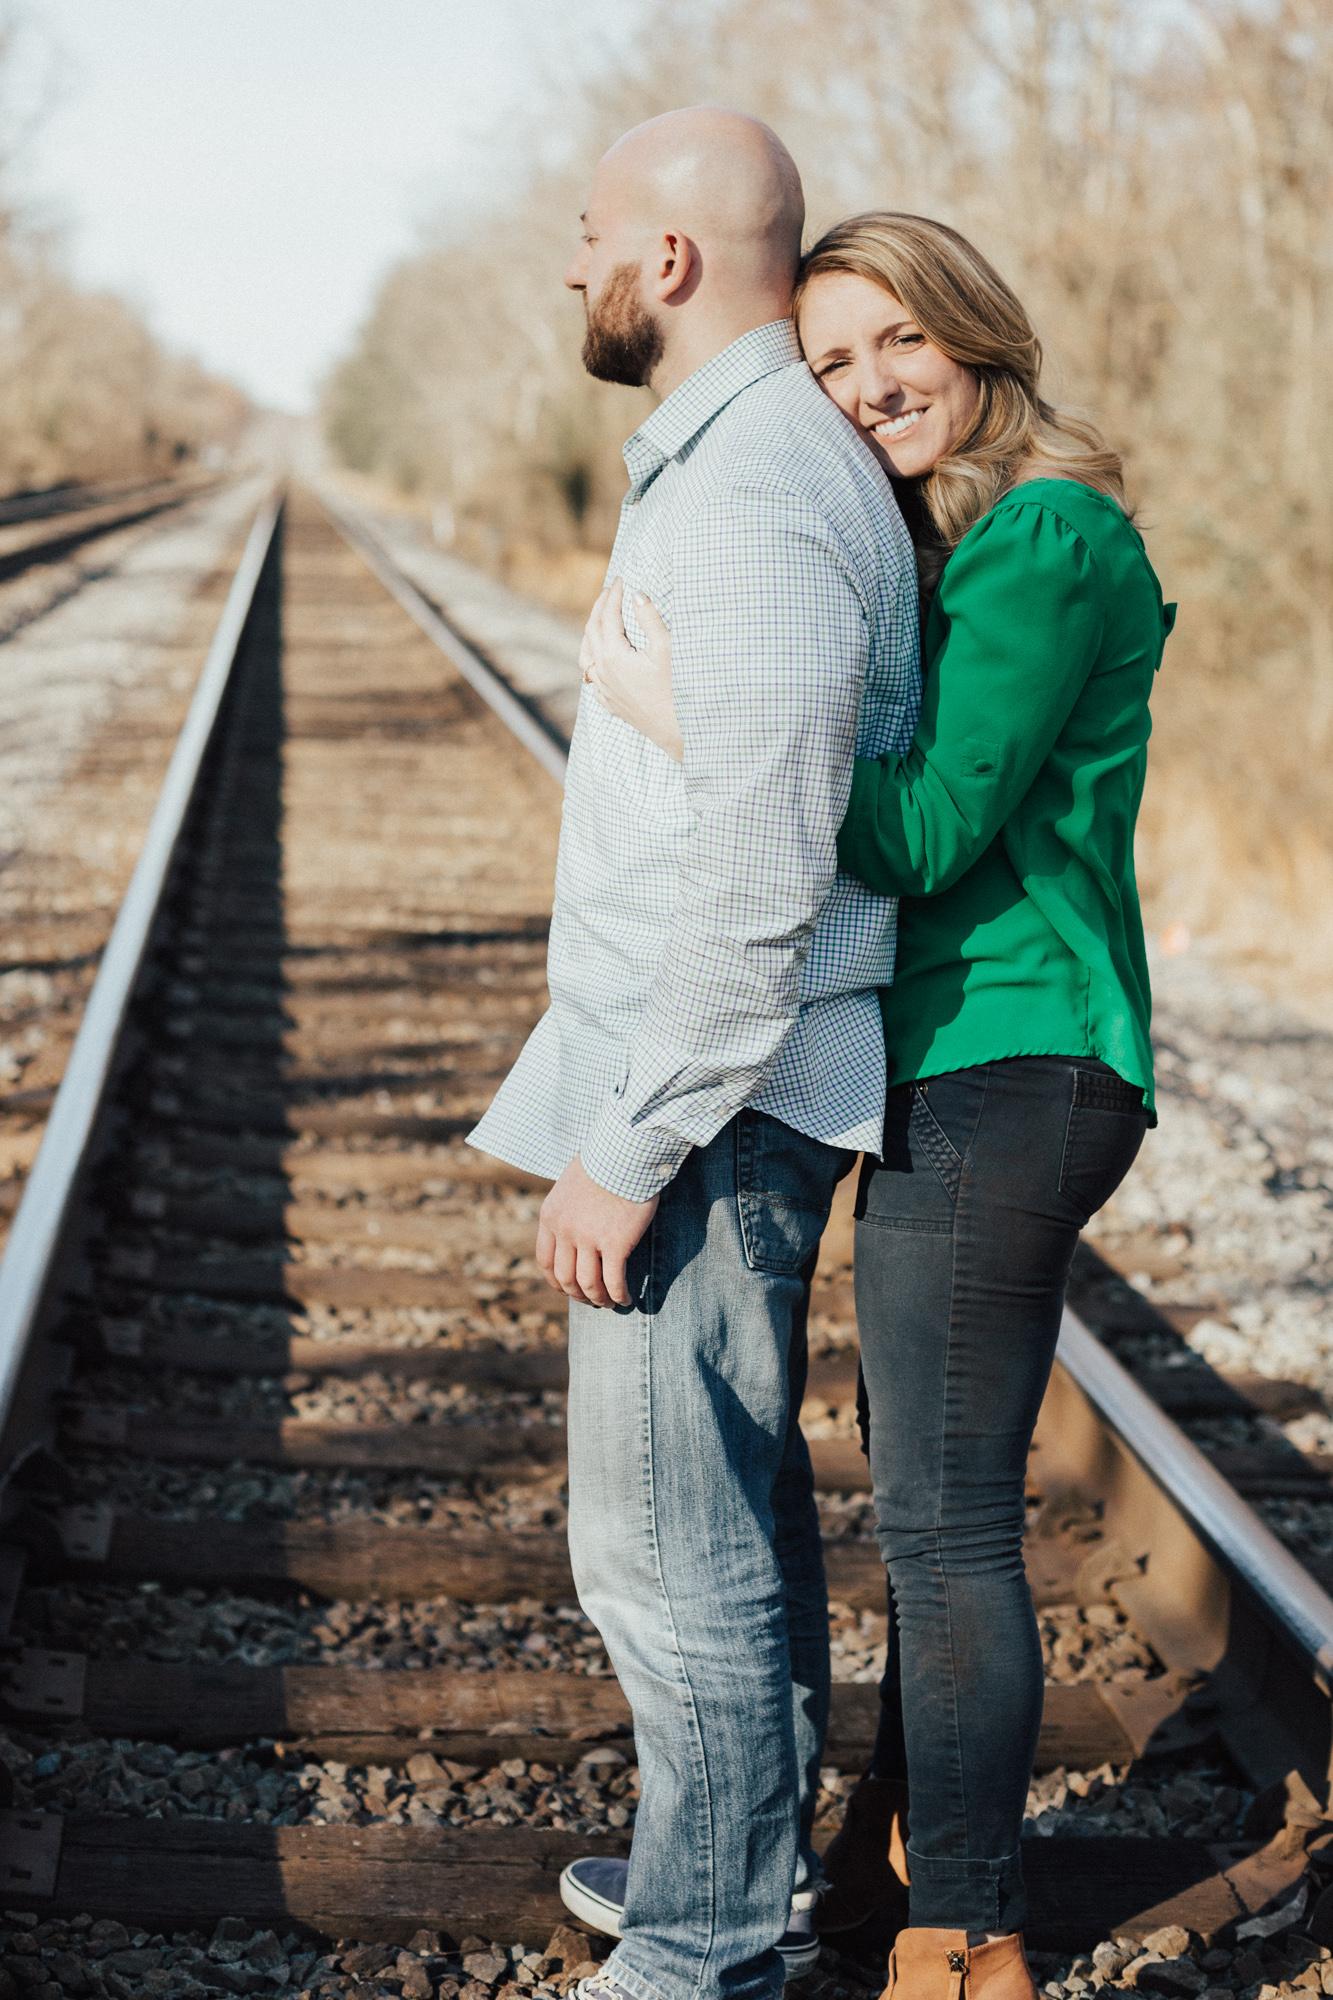 Josh & Steph | Engaged-10.jpg